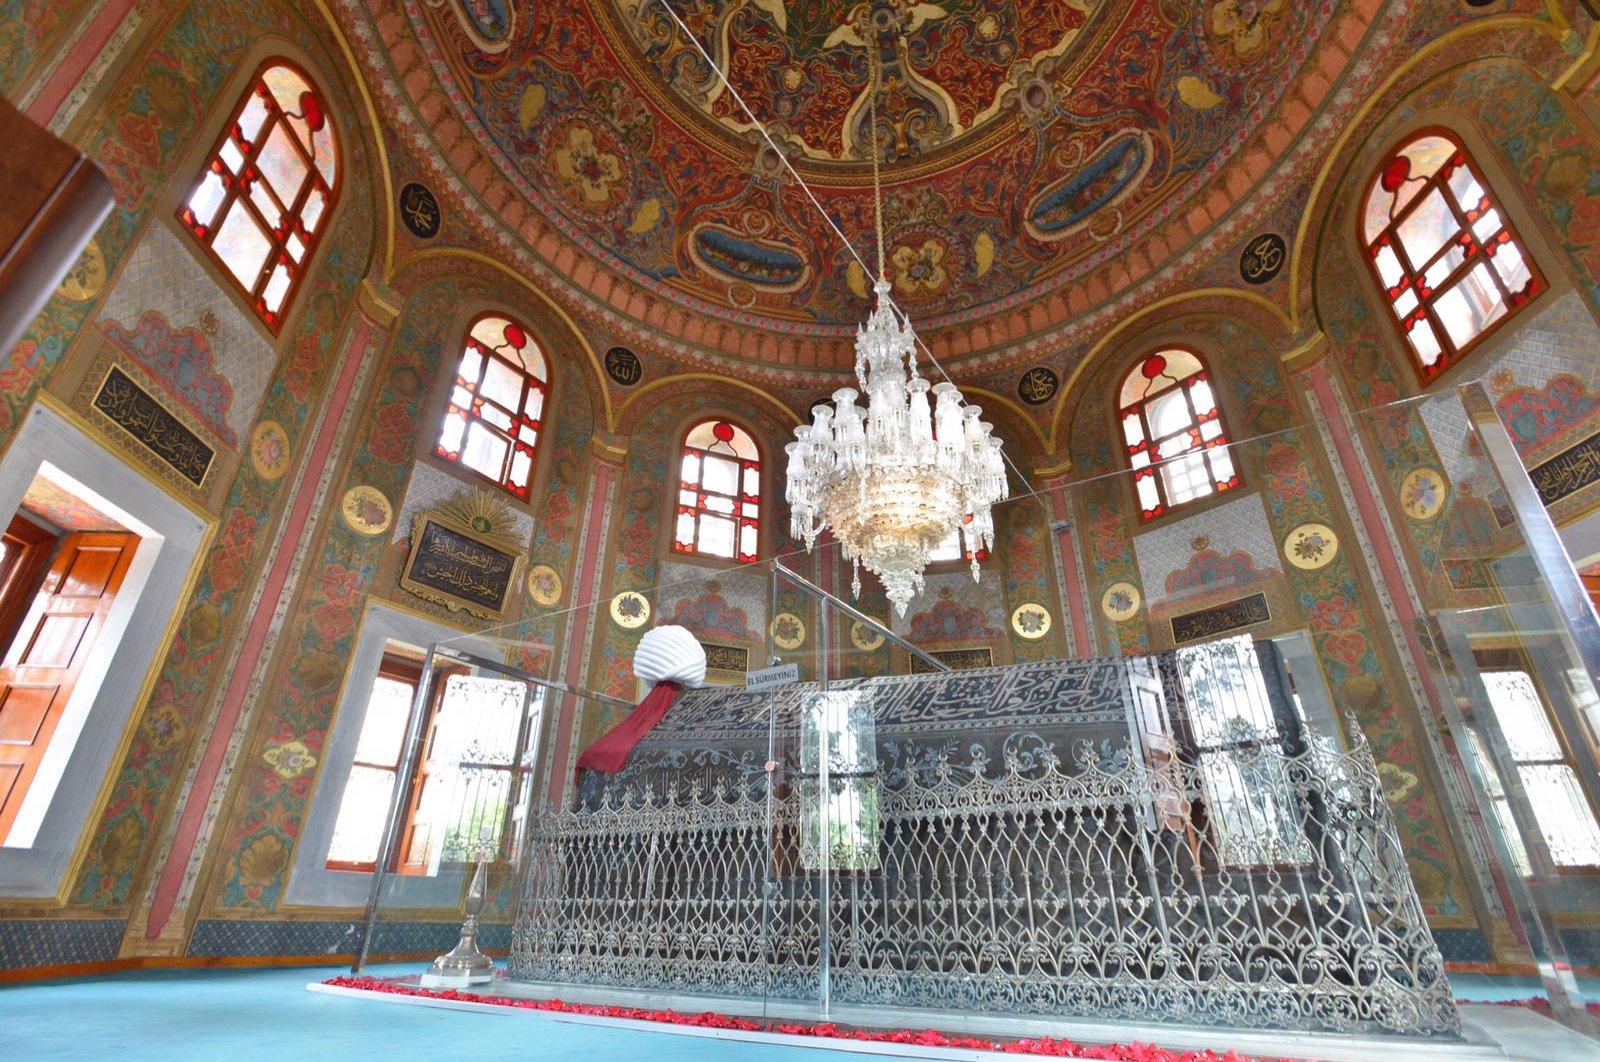 A photo from the interior of the Hagia Sophia Fatih Madrasah.